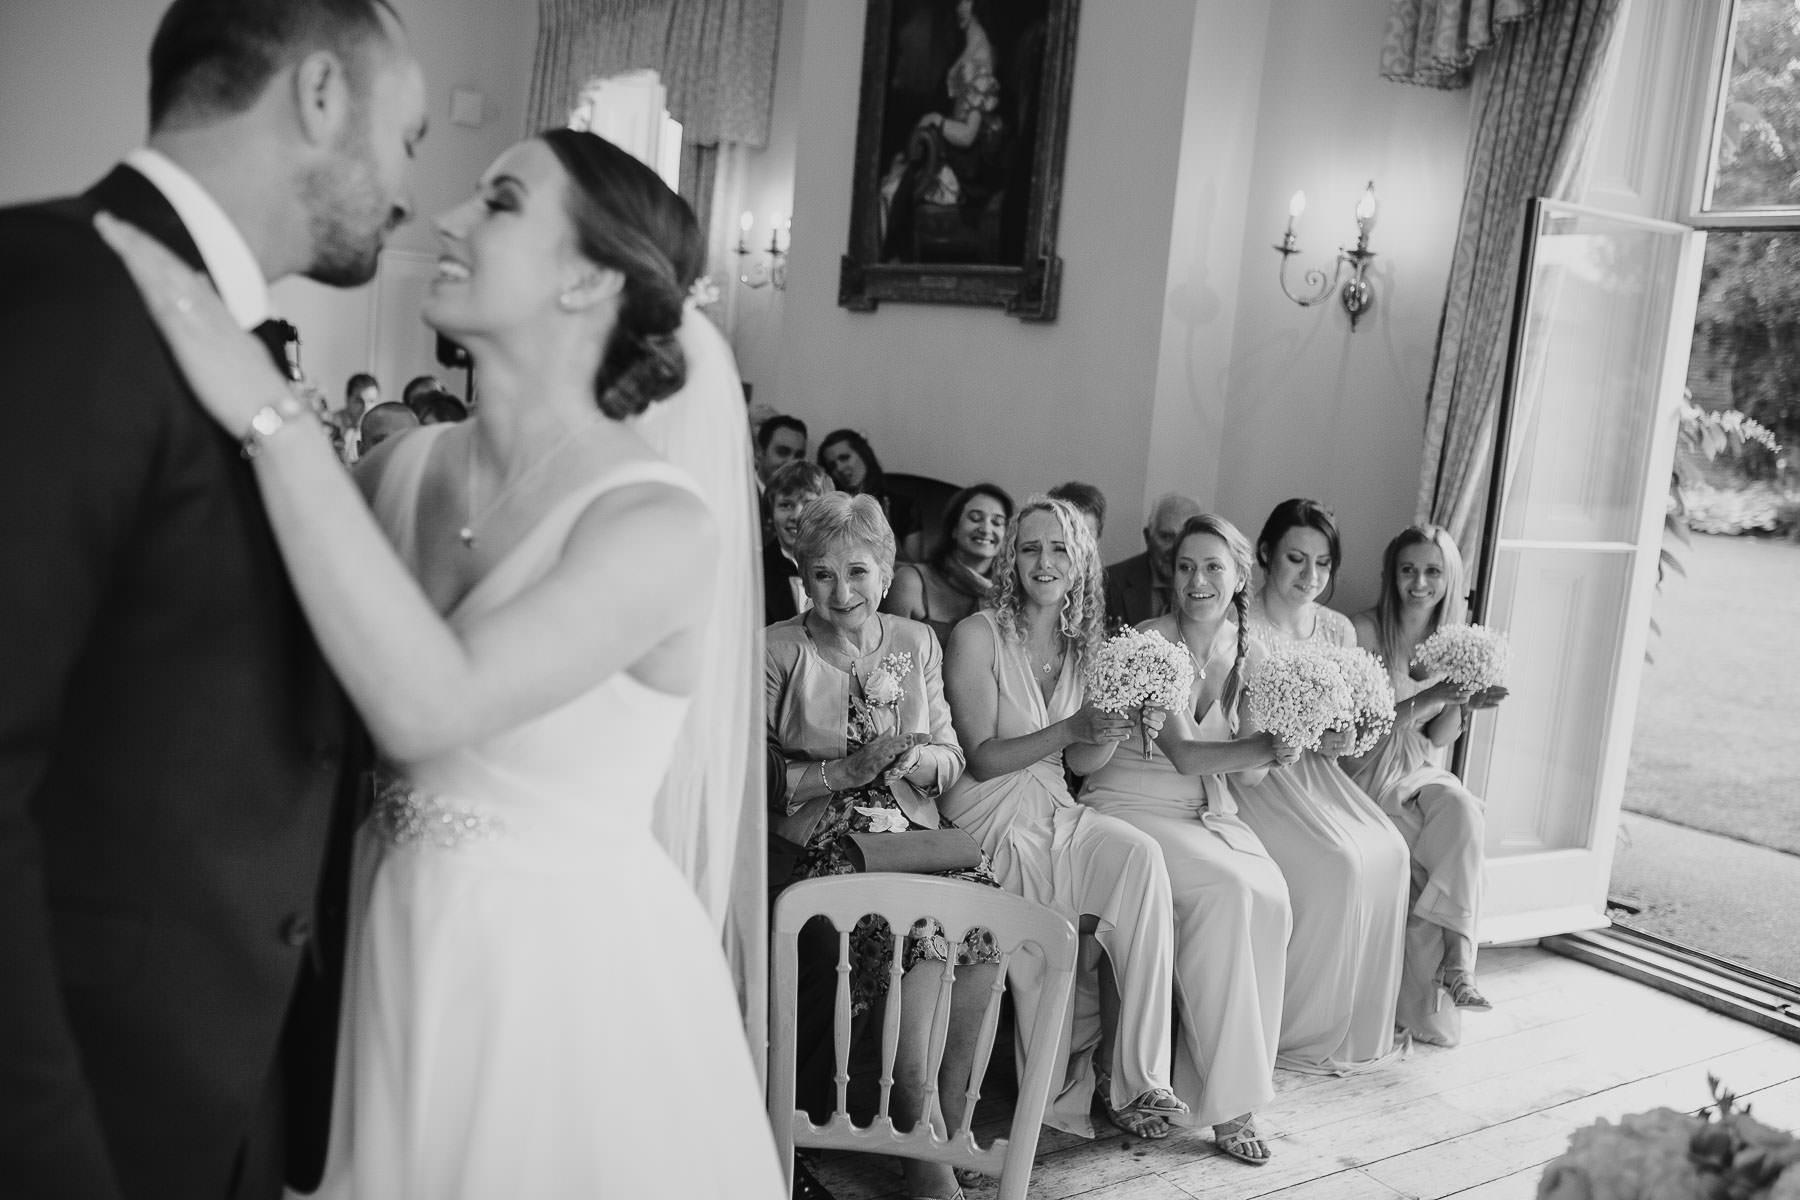 kew gardens wedding photography astra duncan23